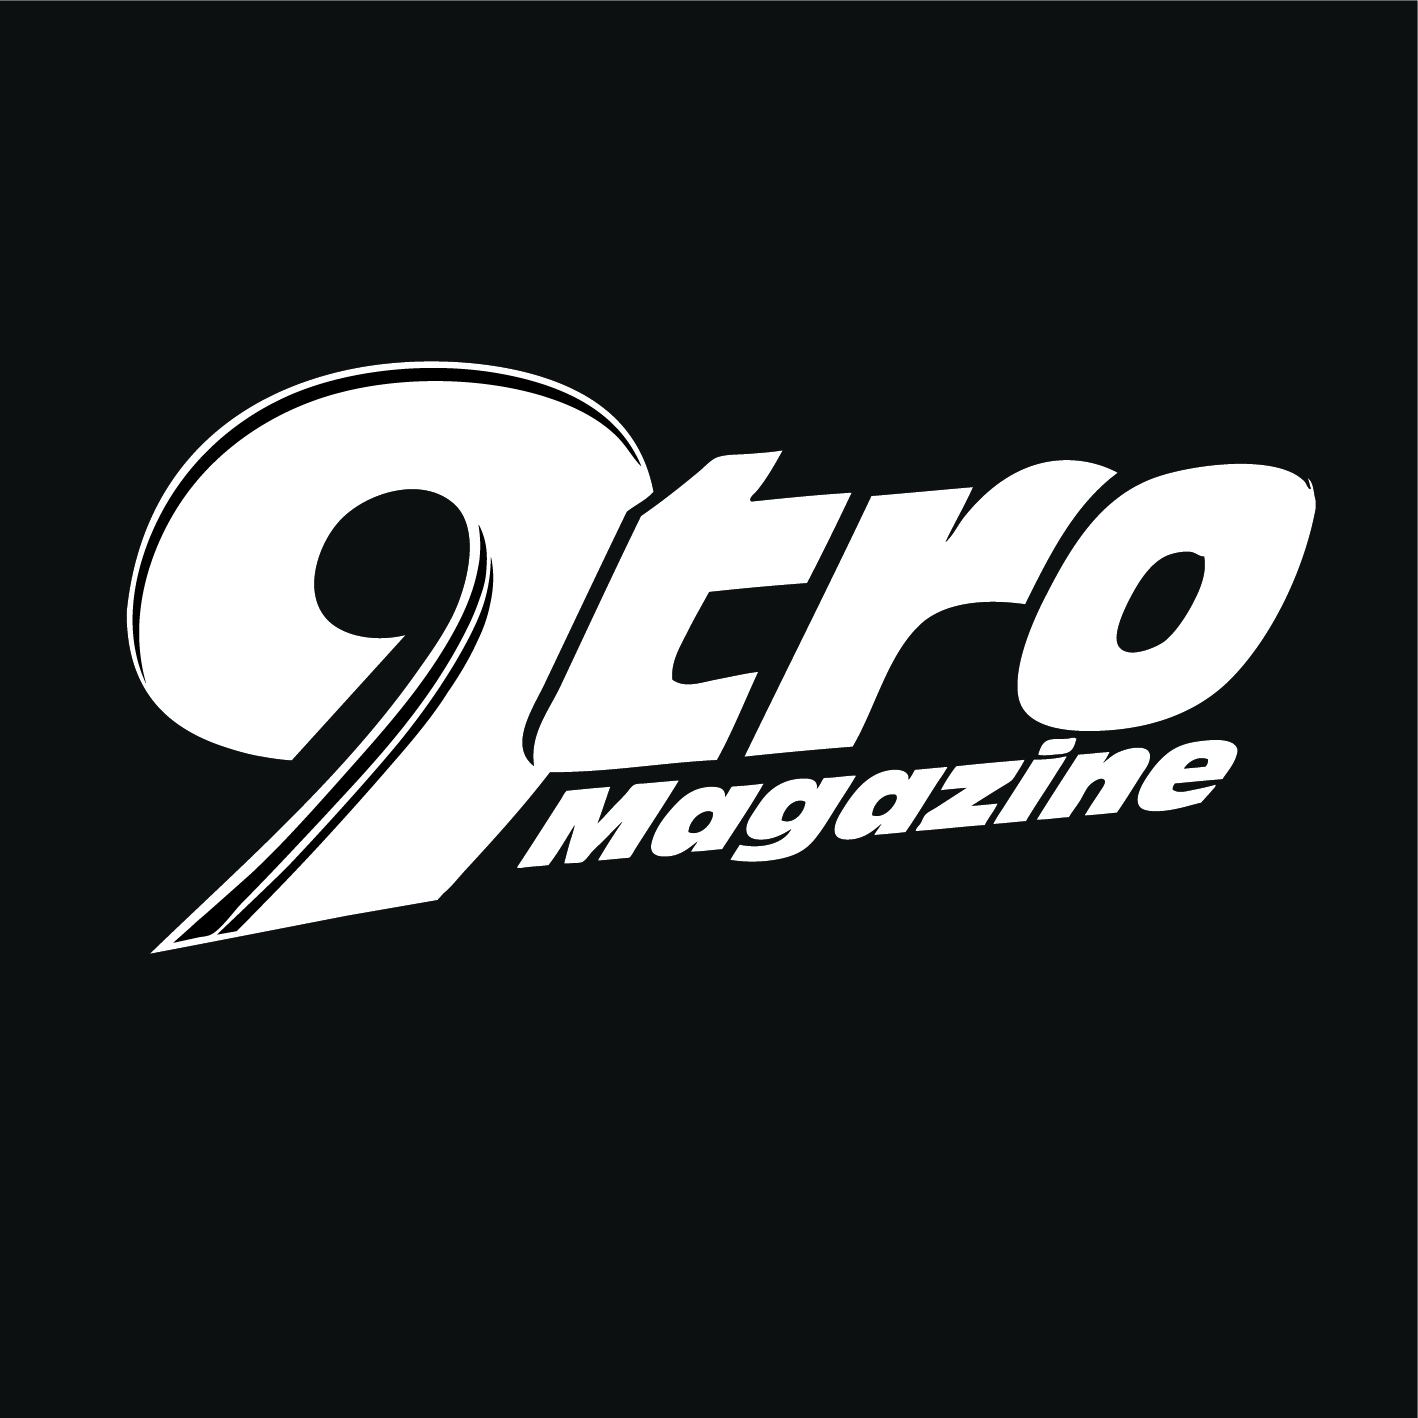 of a car magazine,